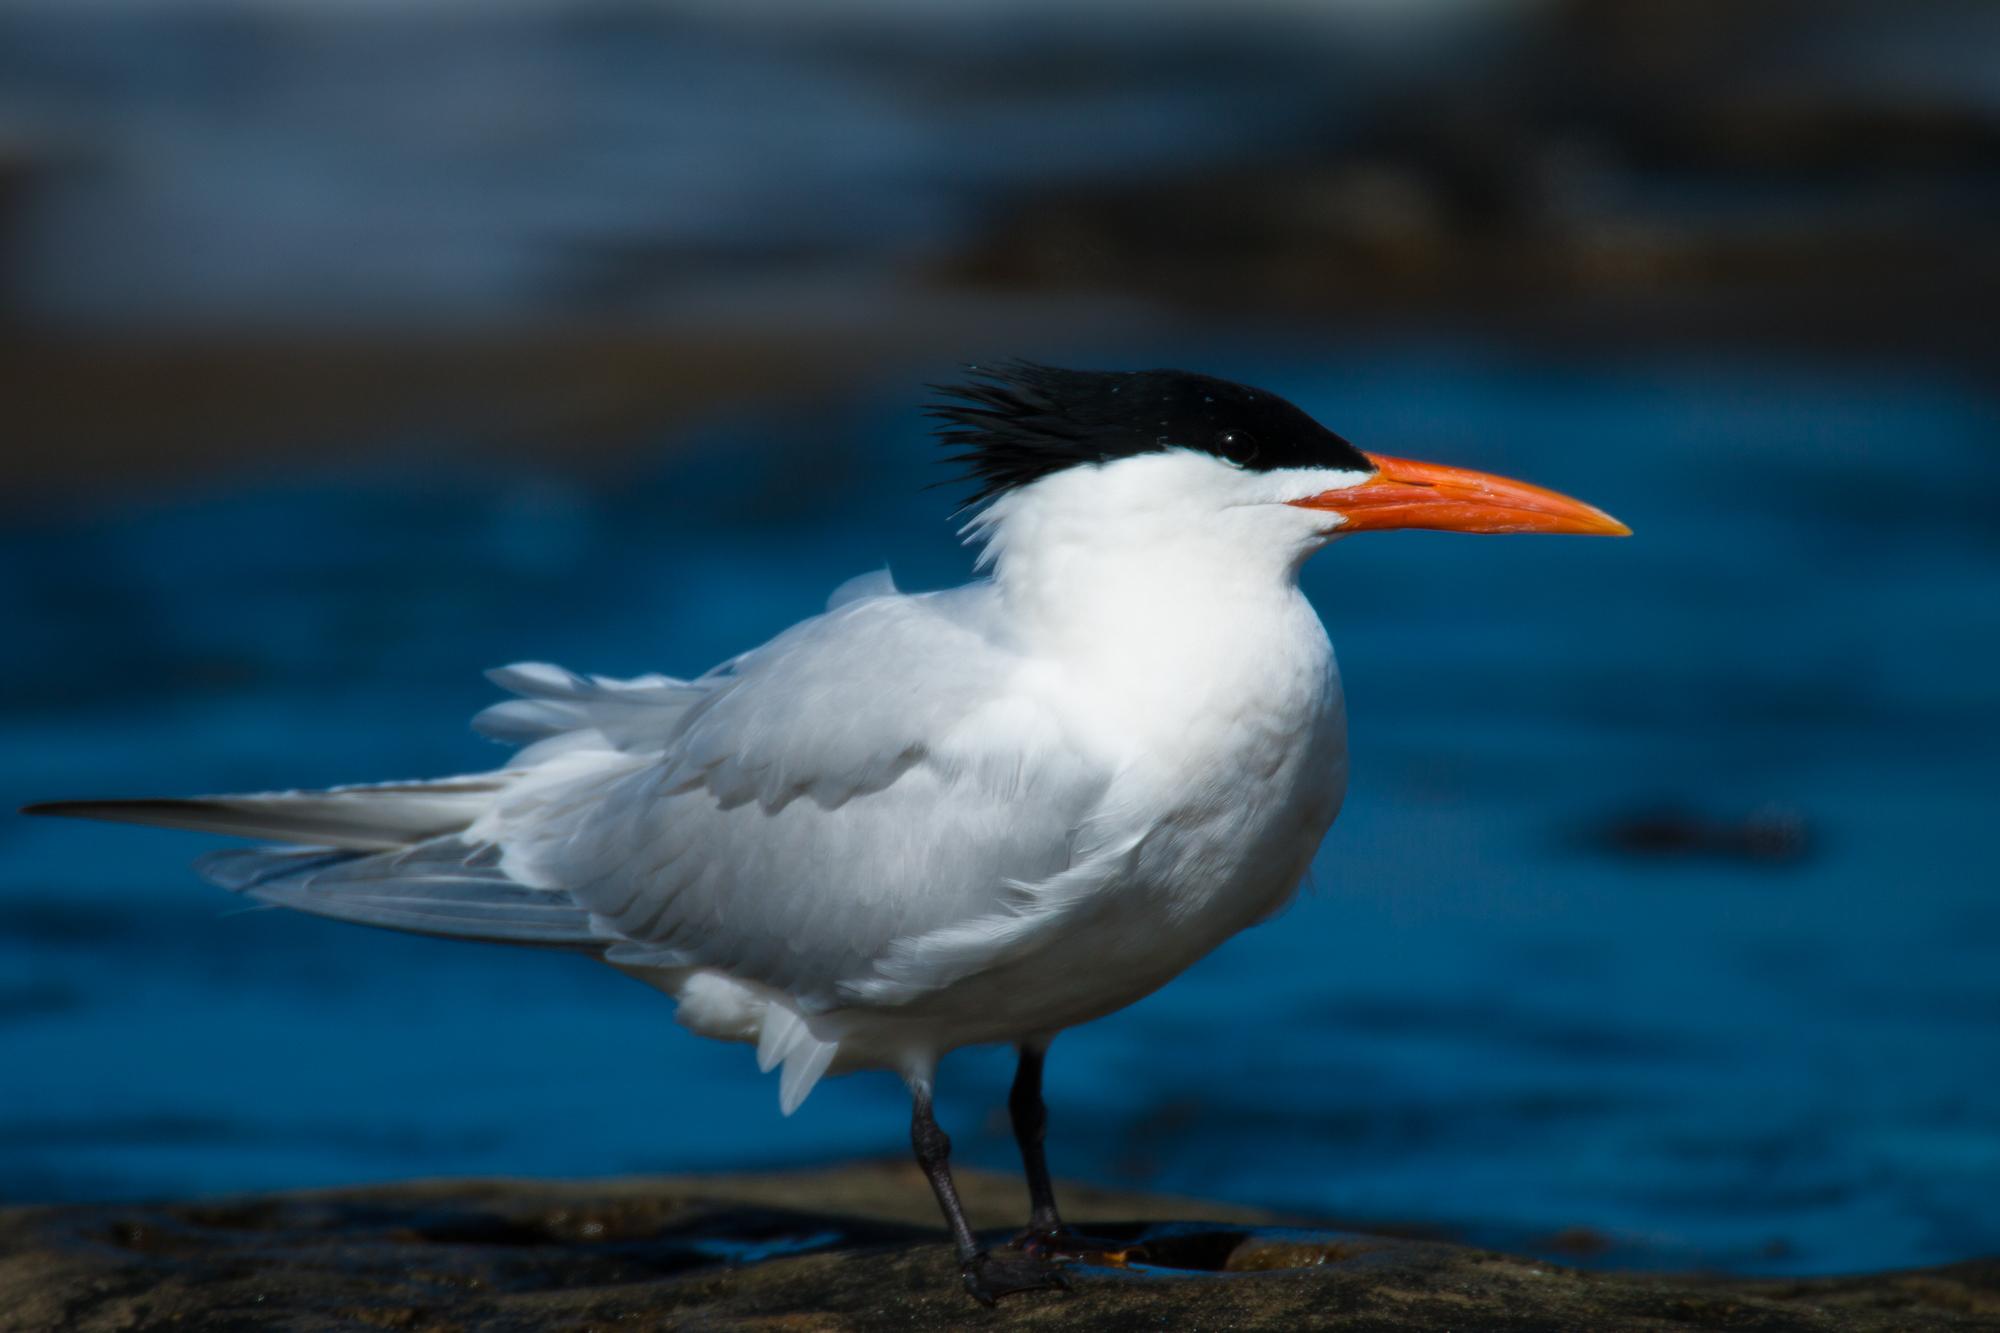 Royal Tern - Alternate Plumage..繁殖羽衣的橙嘴凤头燕鸥